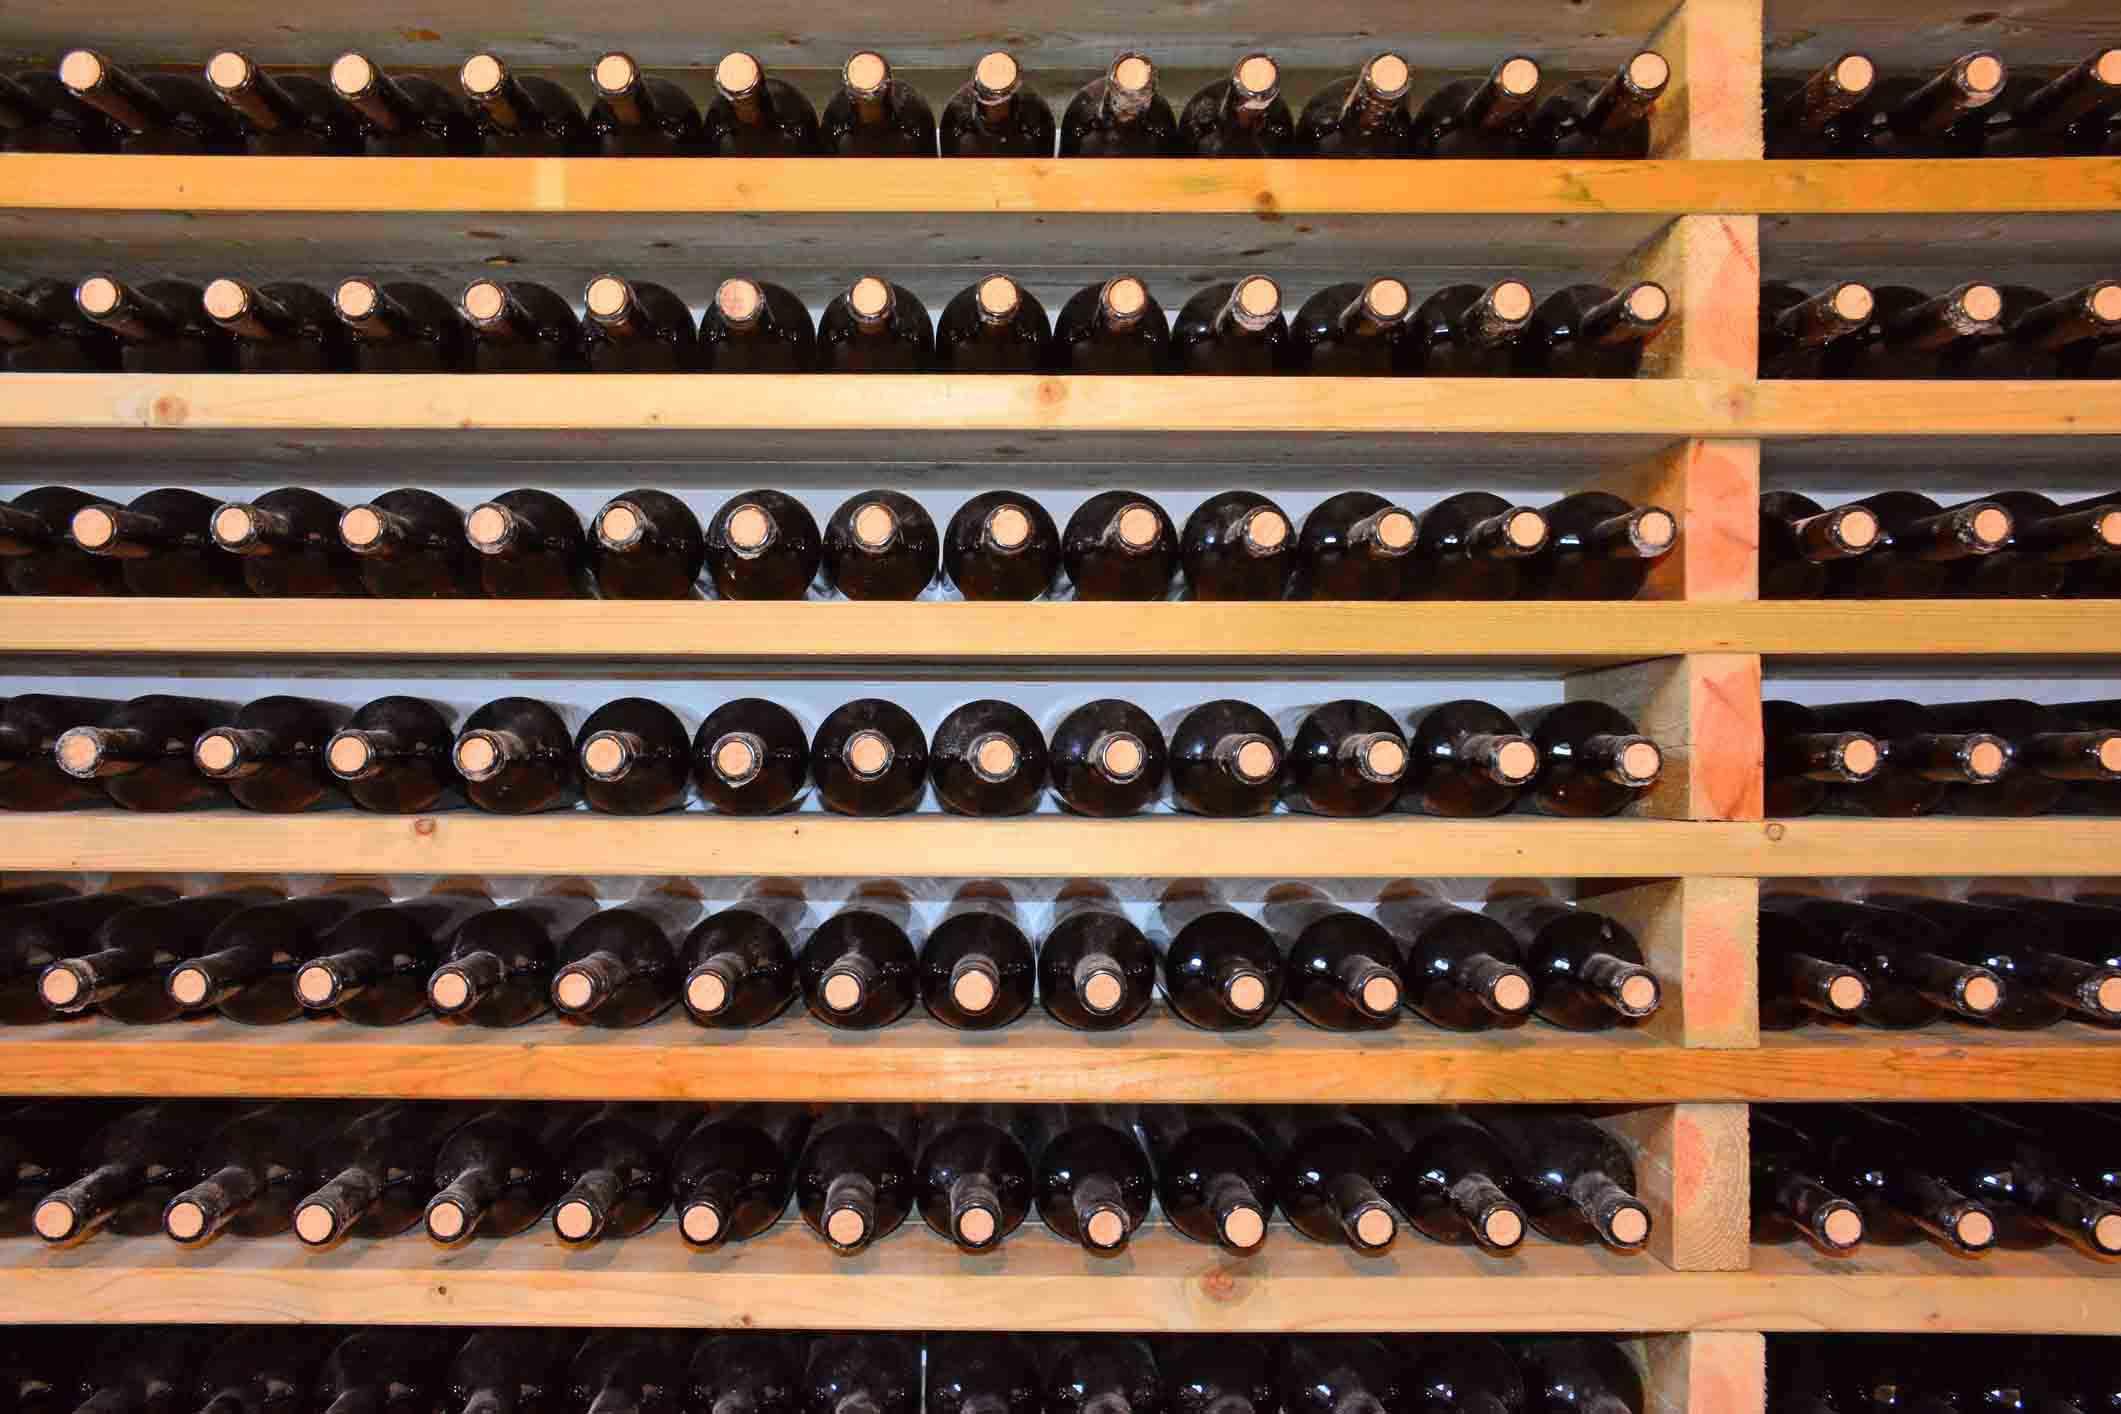 Reno Rocket Basement Renovation Idea - Basement Wine cellar